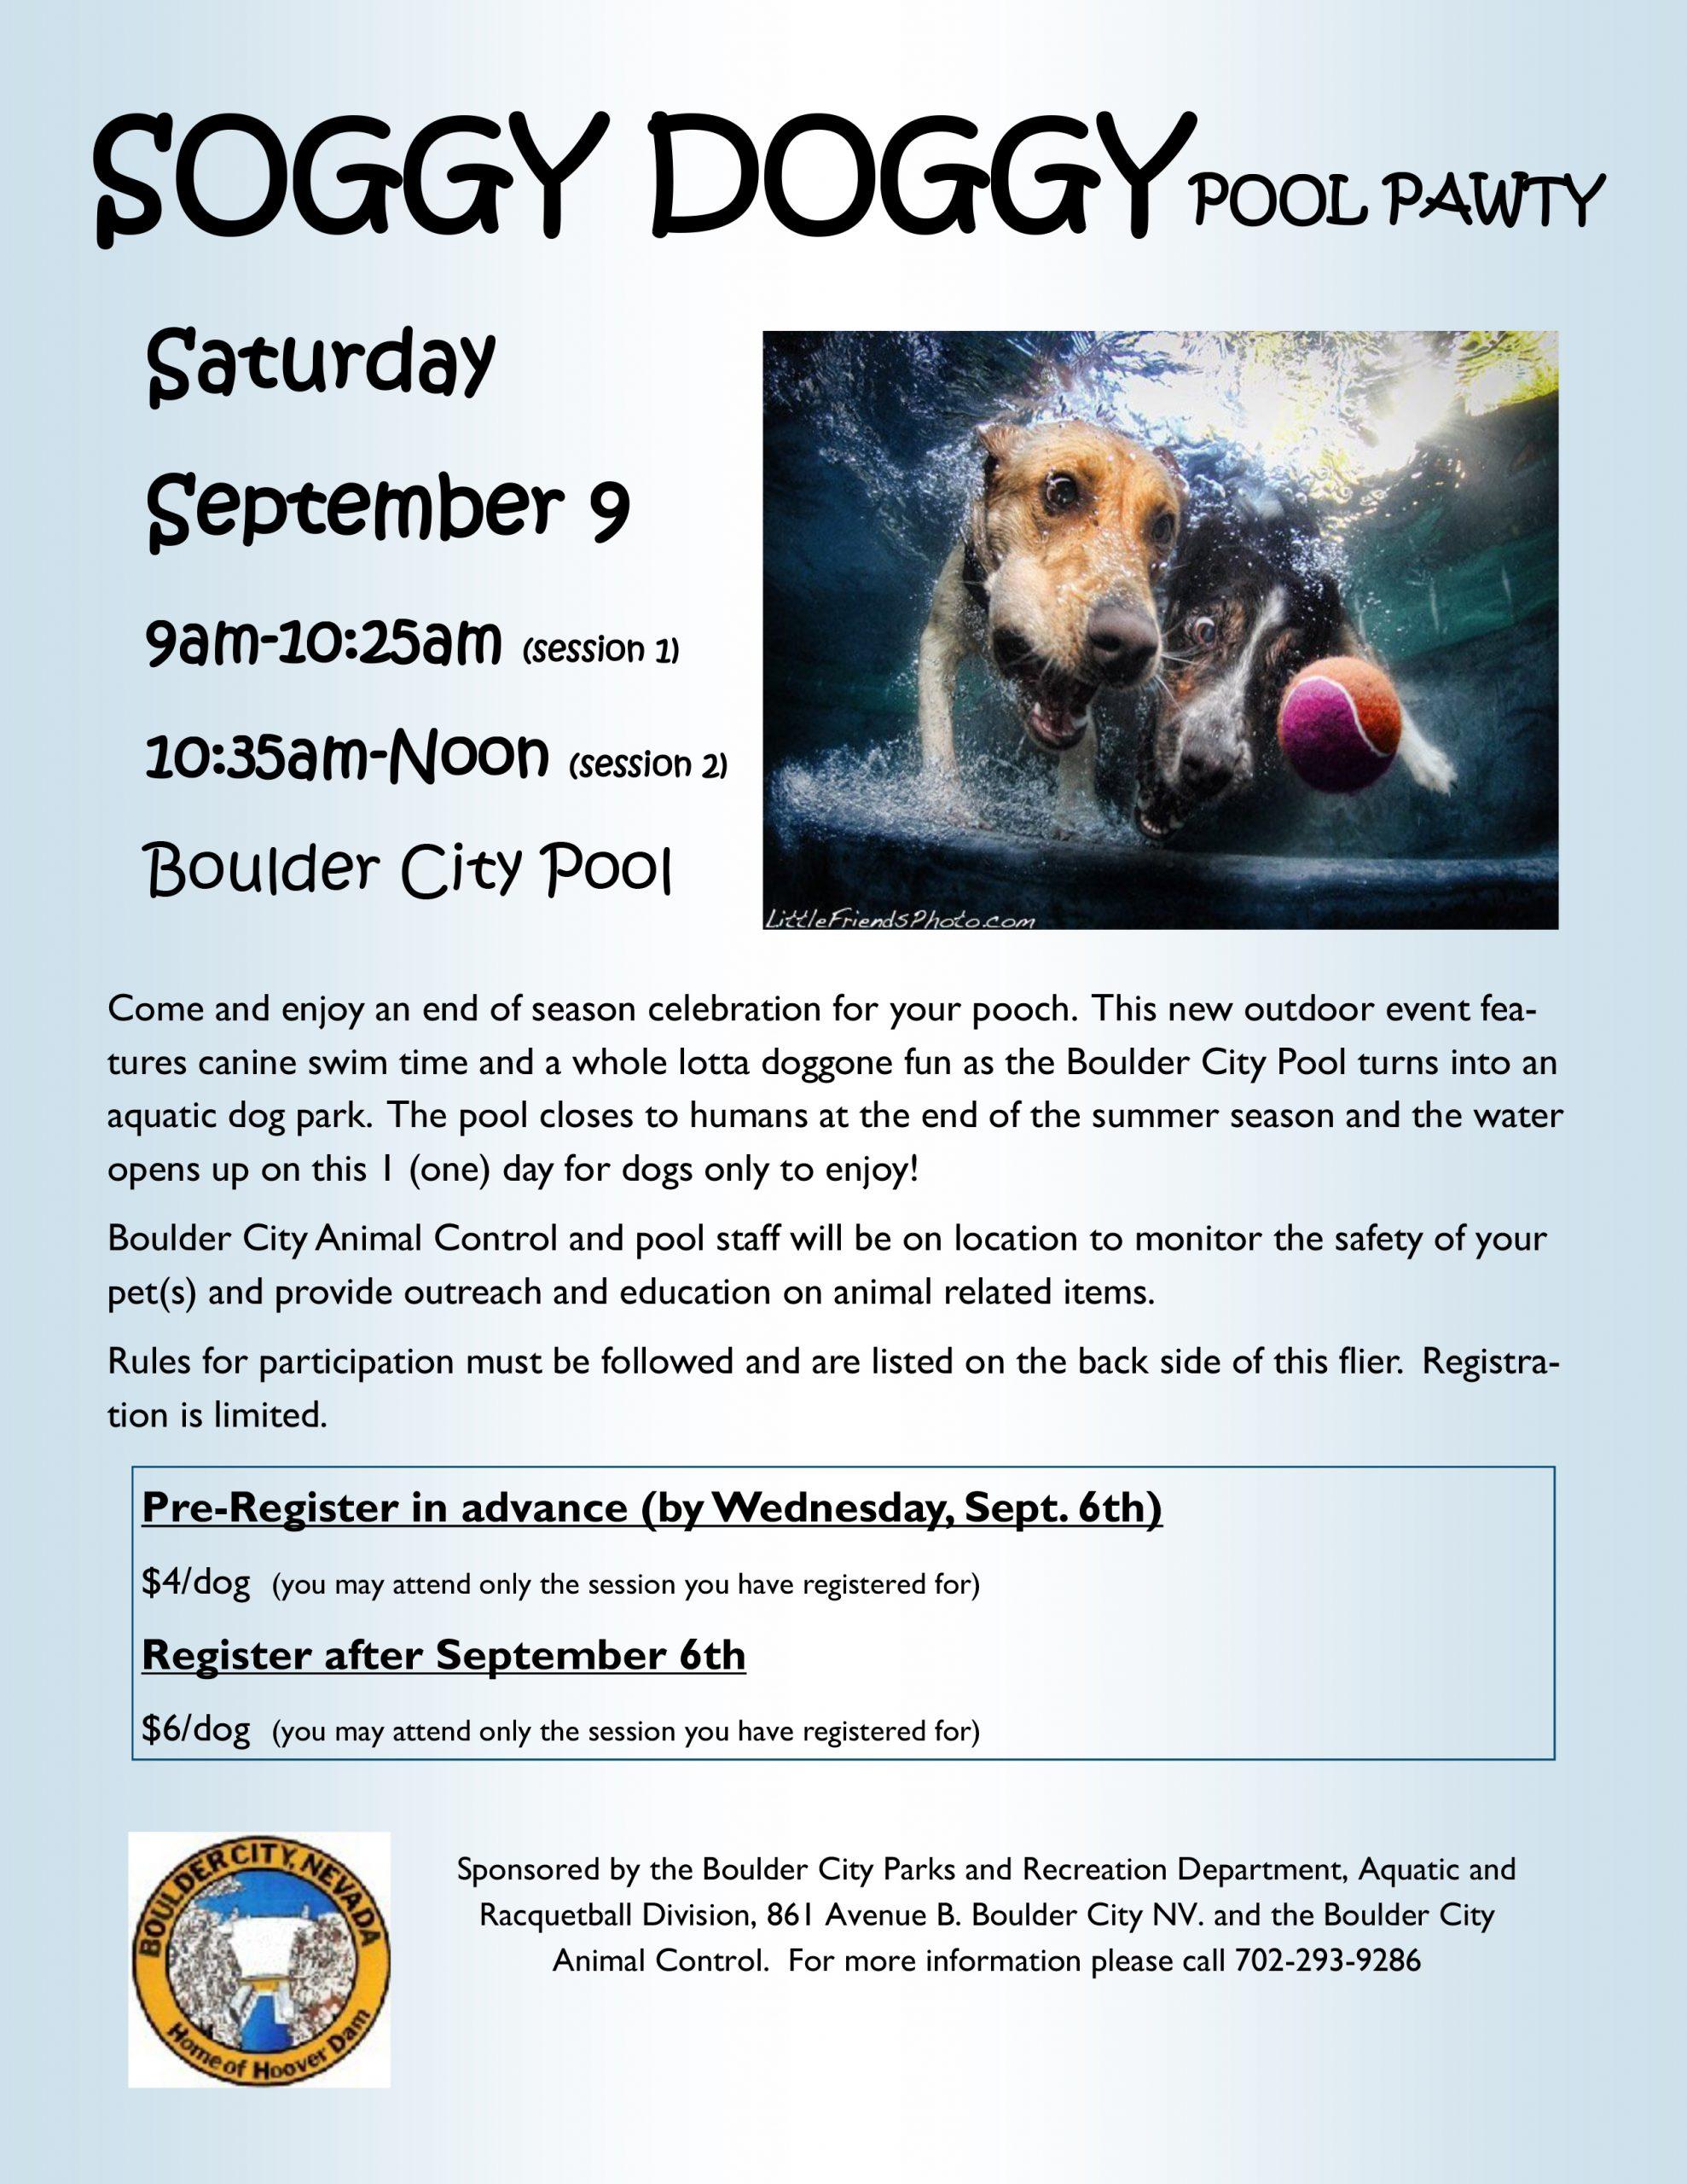 2017-Soggy Doggy Flier Boulder City, NV